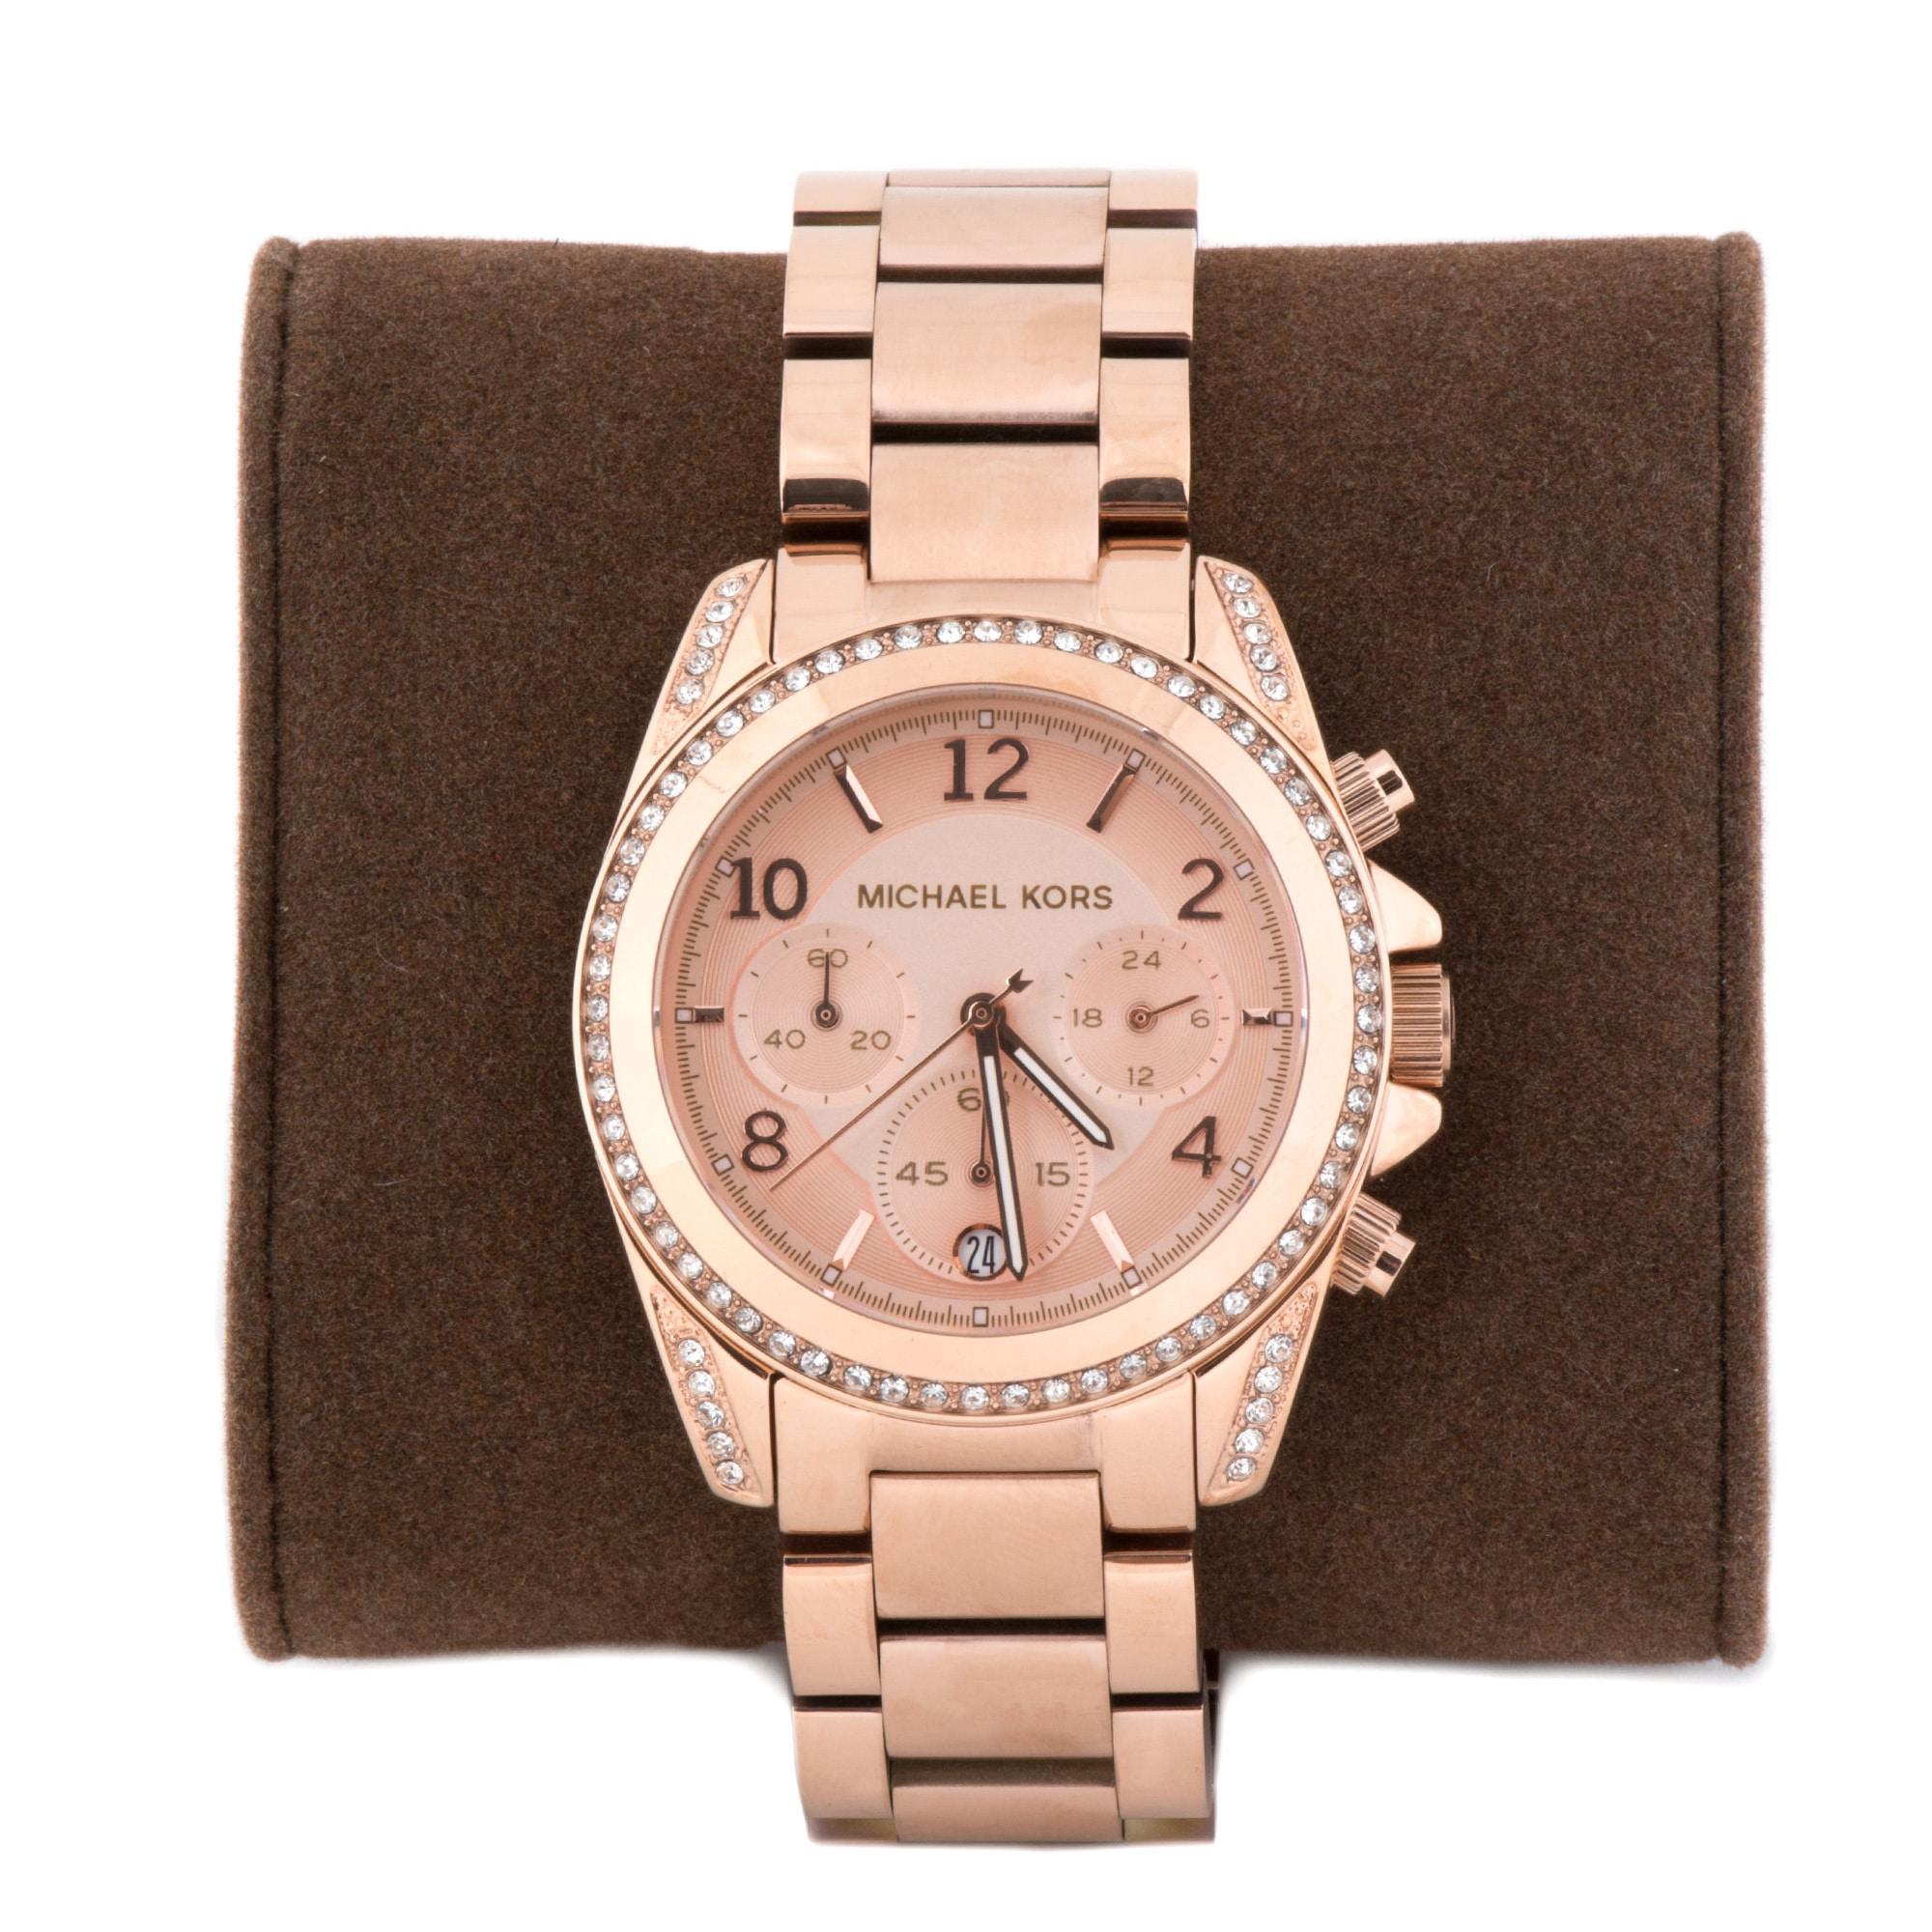 9644d83c8d50 Shop Michael Kors Women s MK5263  Blair  Rose Gold-Tone Chronograph Watch -  Free Shipping Today - Overstock - 5336896